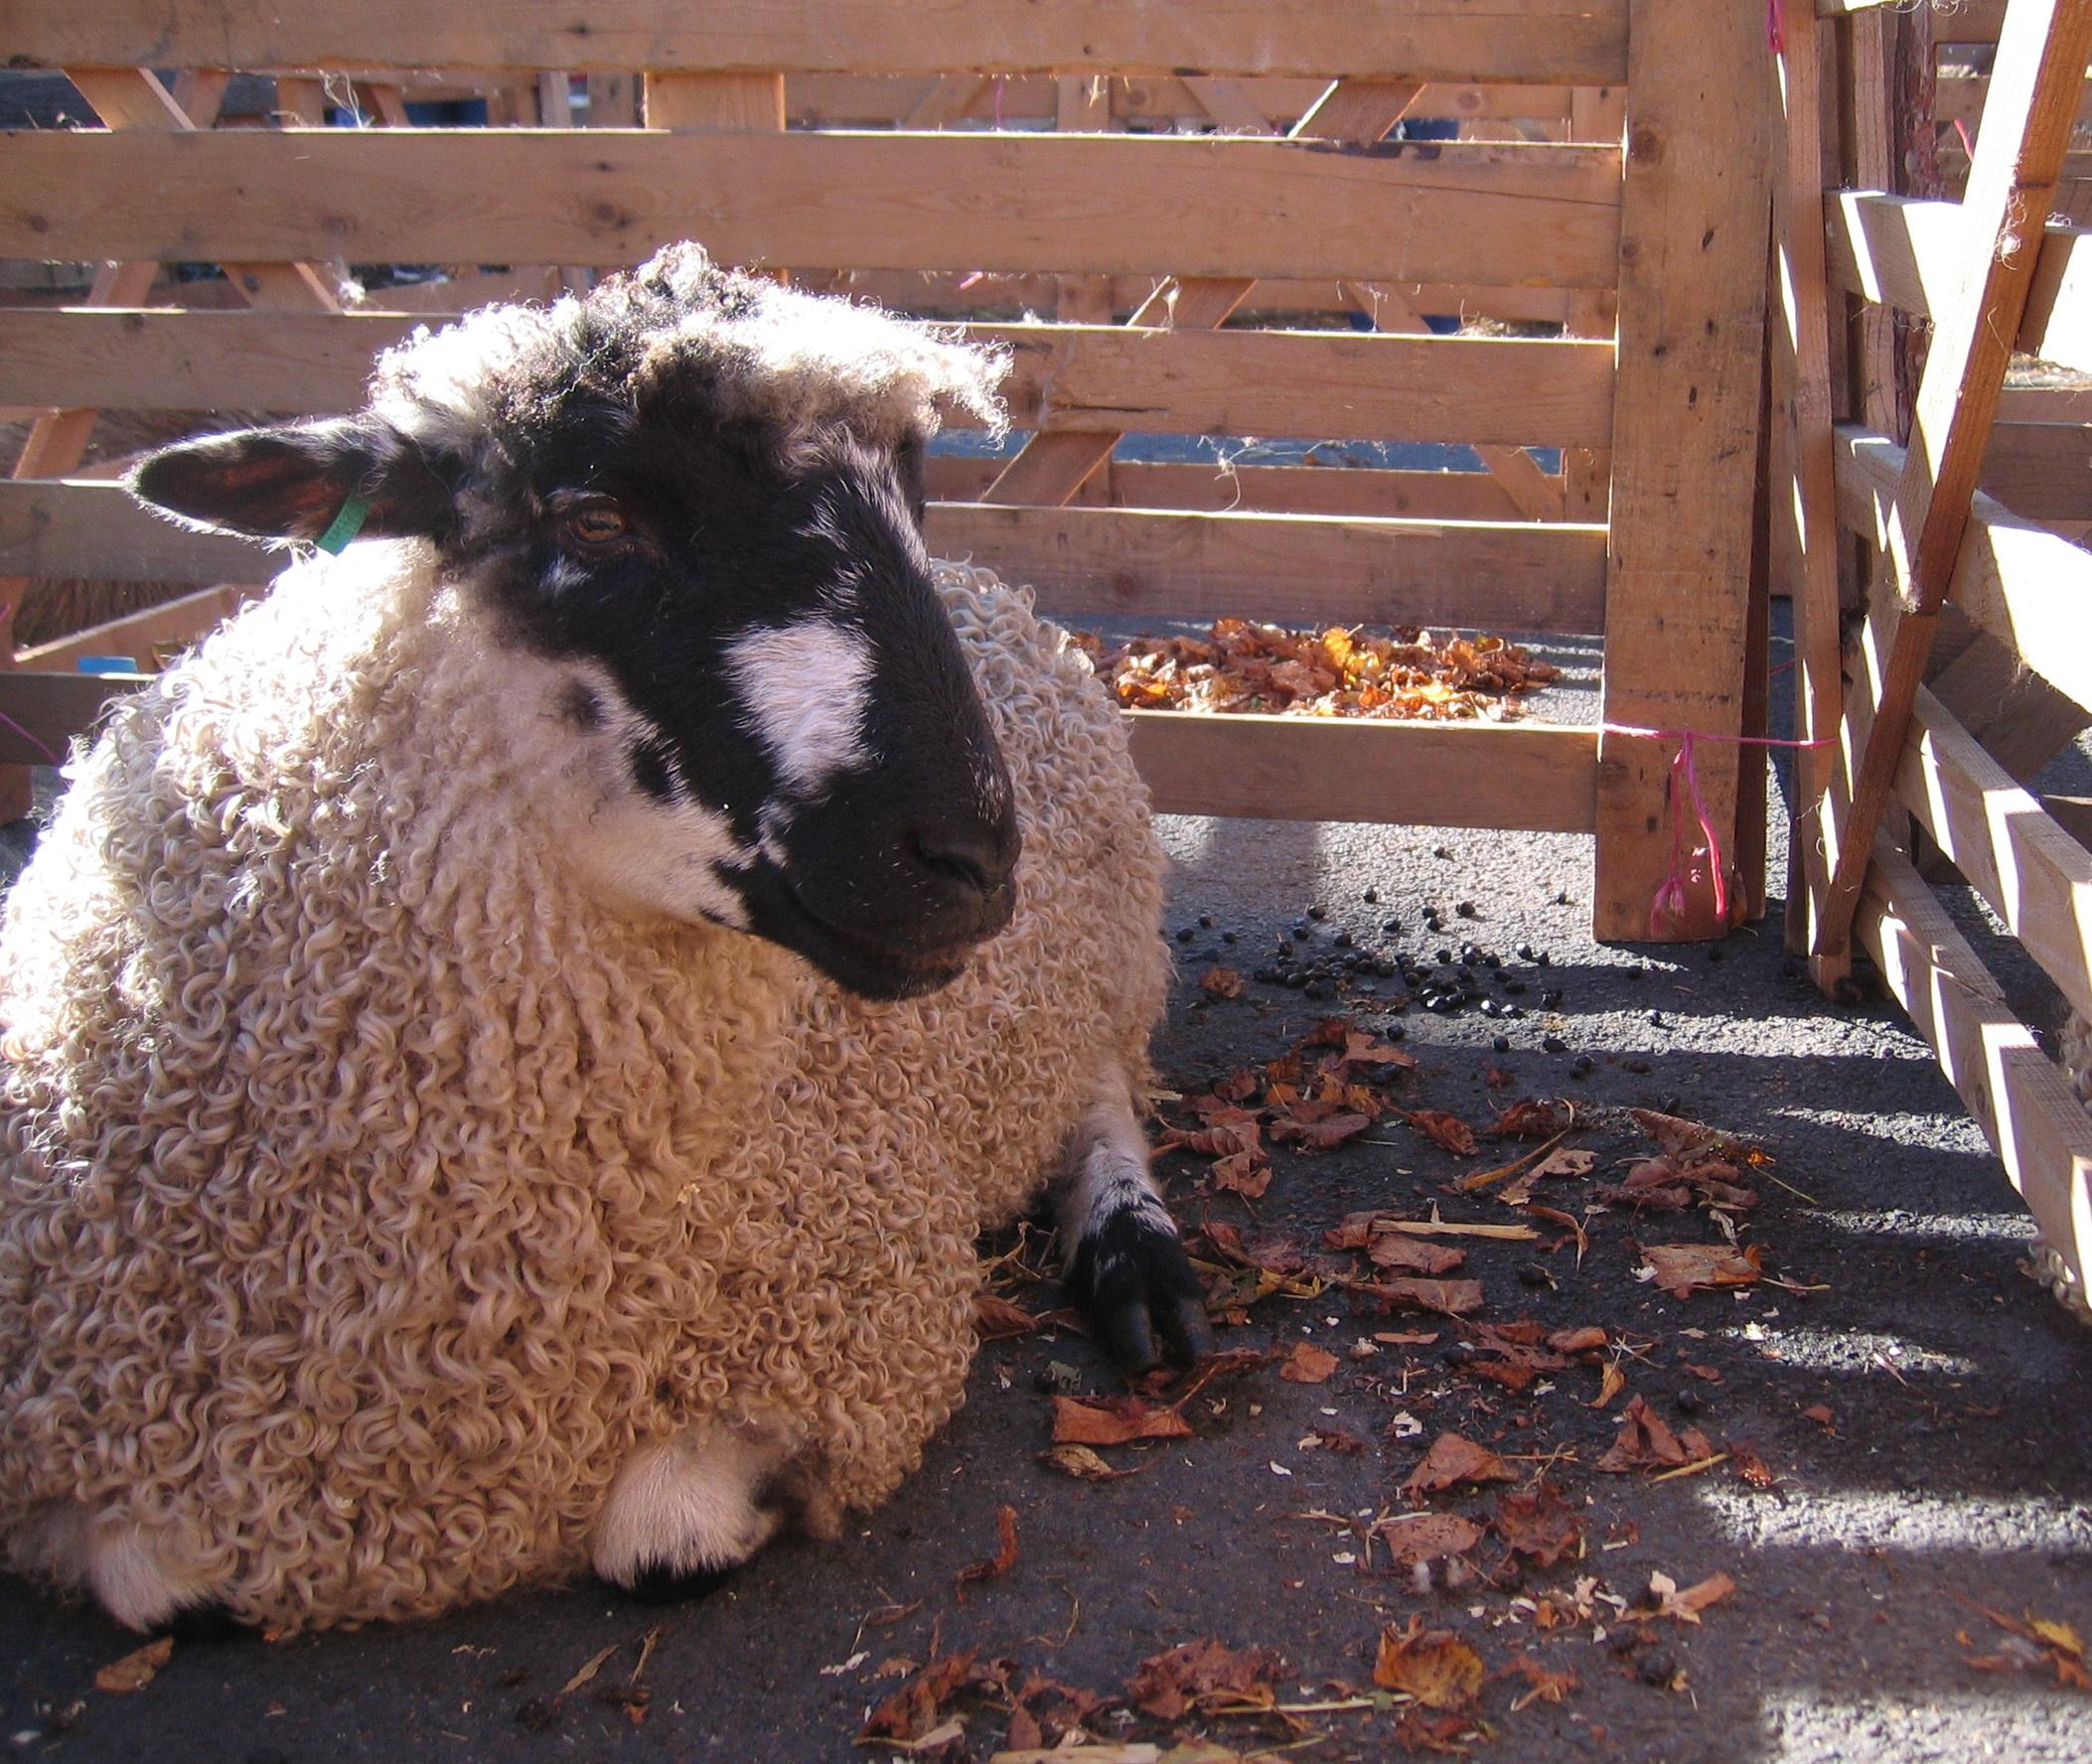 BRITISH SHEEP BREEDS - CROSSBREEDS | baa ram ewe